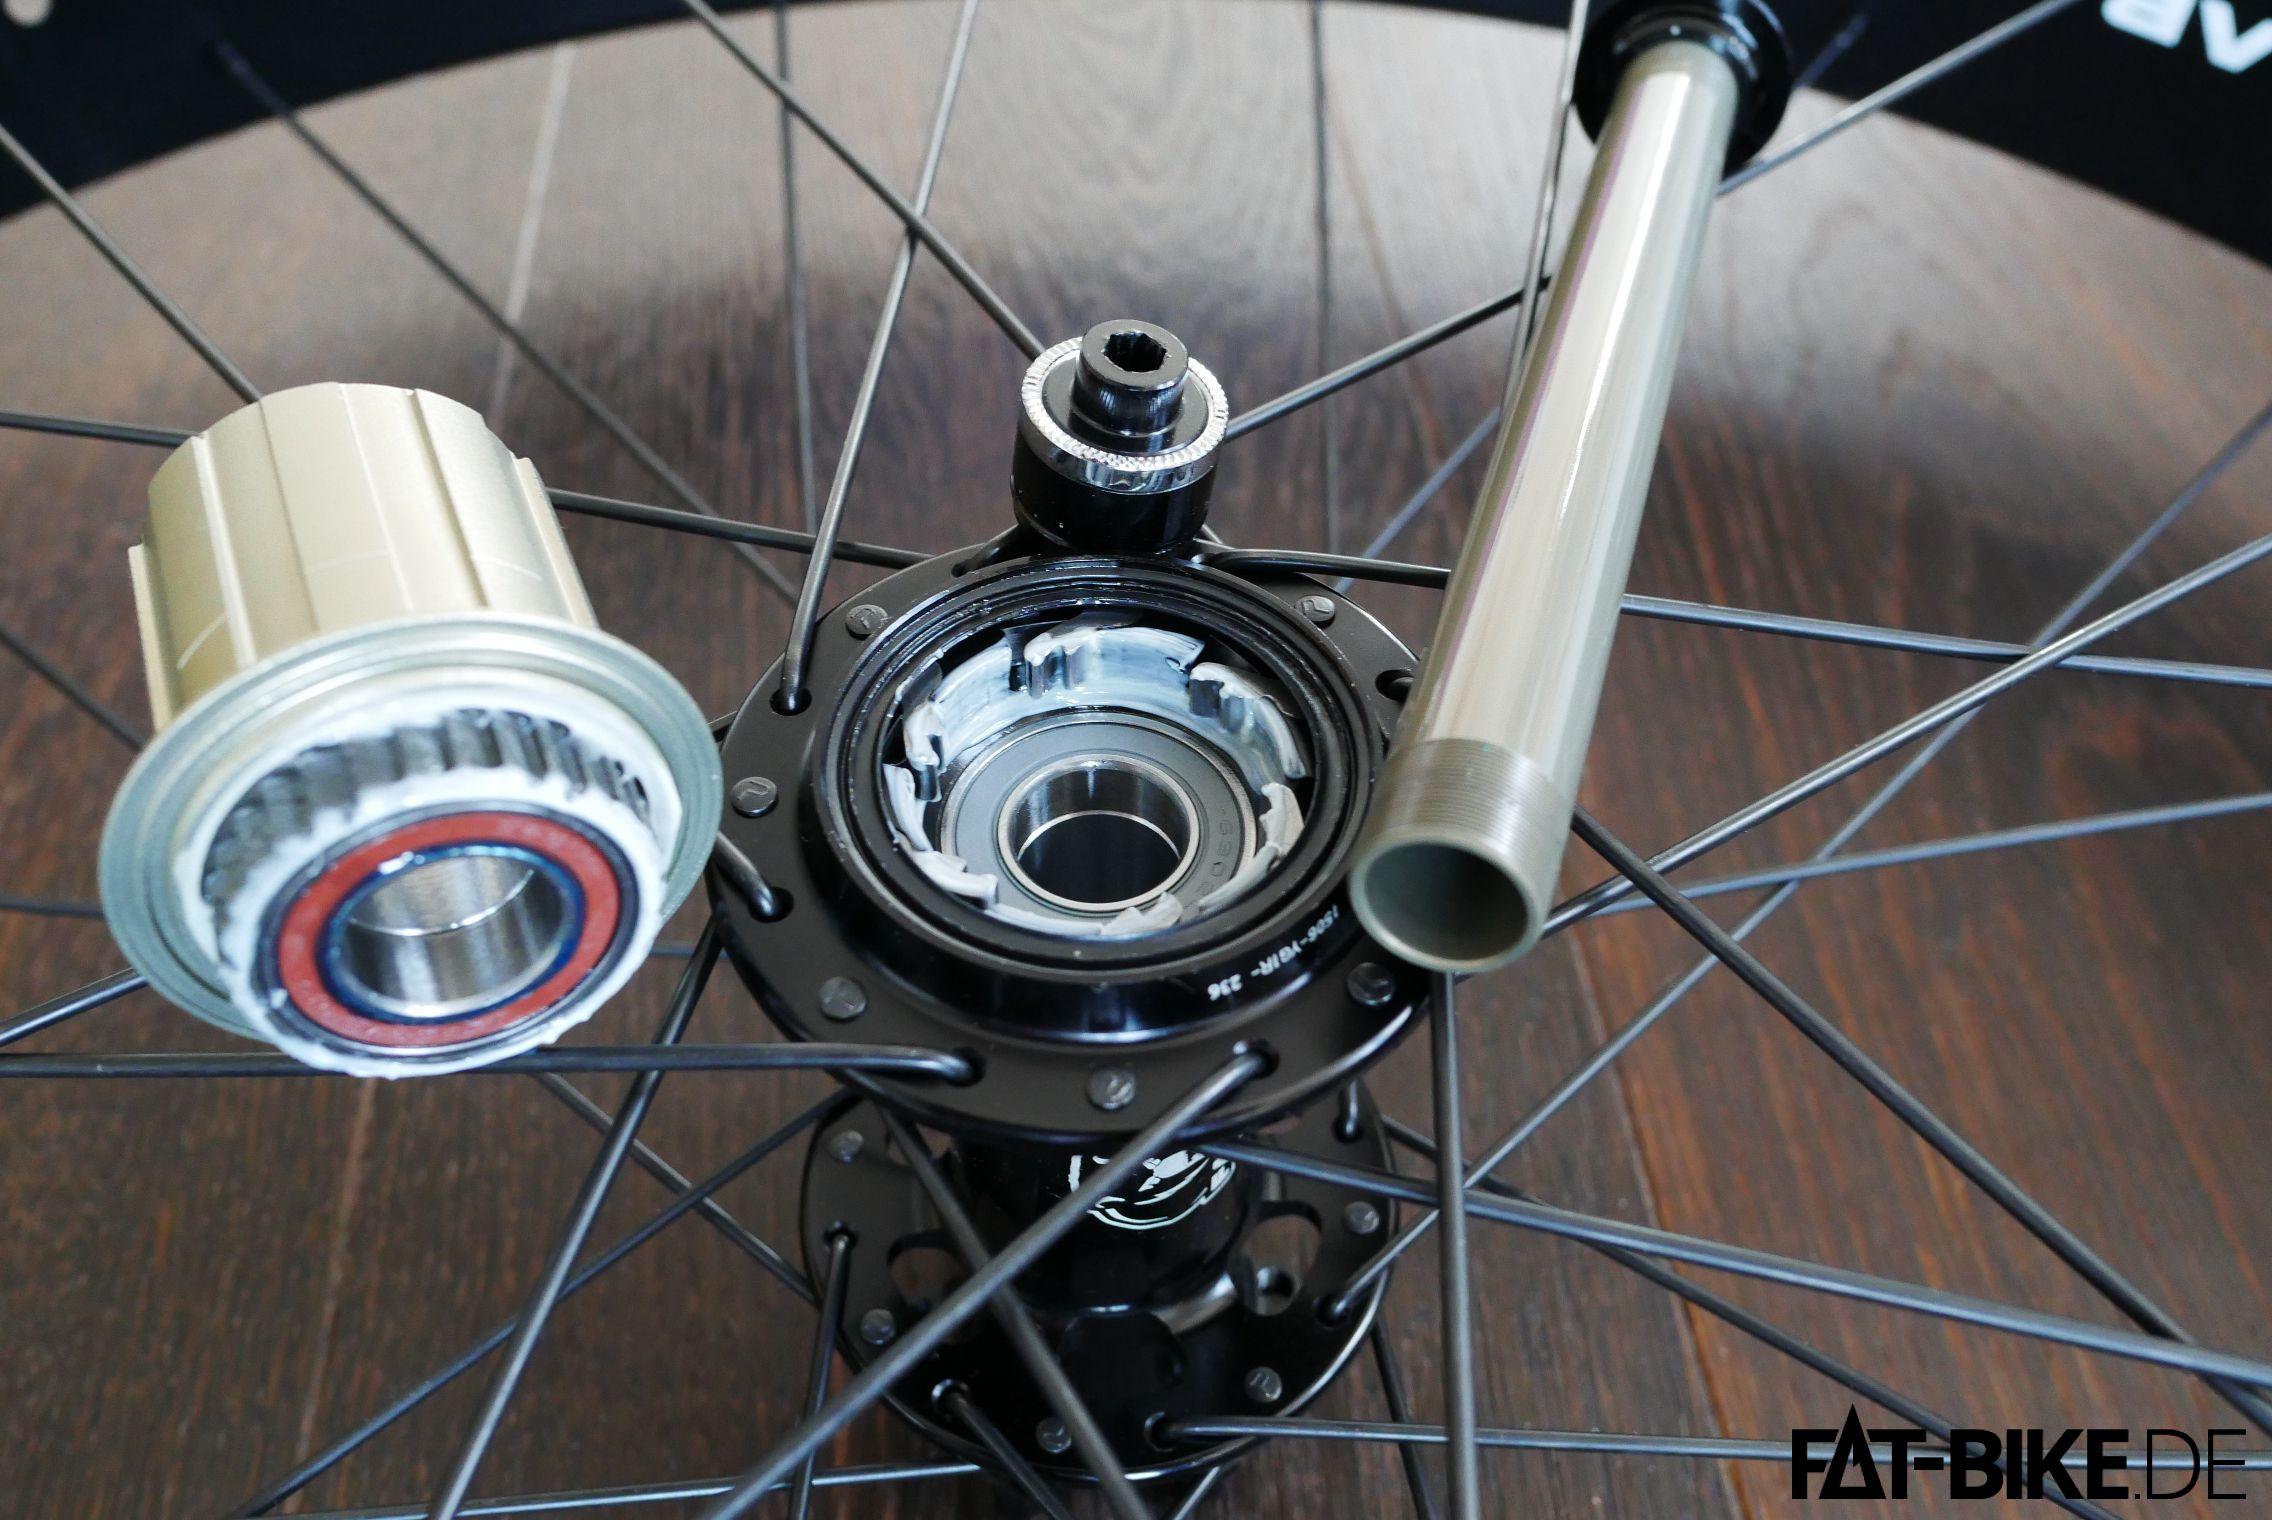 Components & Parts Halo Fat Bike Rear MTB Hub Hubs 170mm 2015